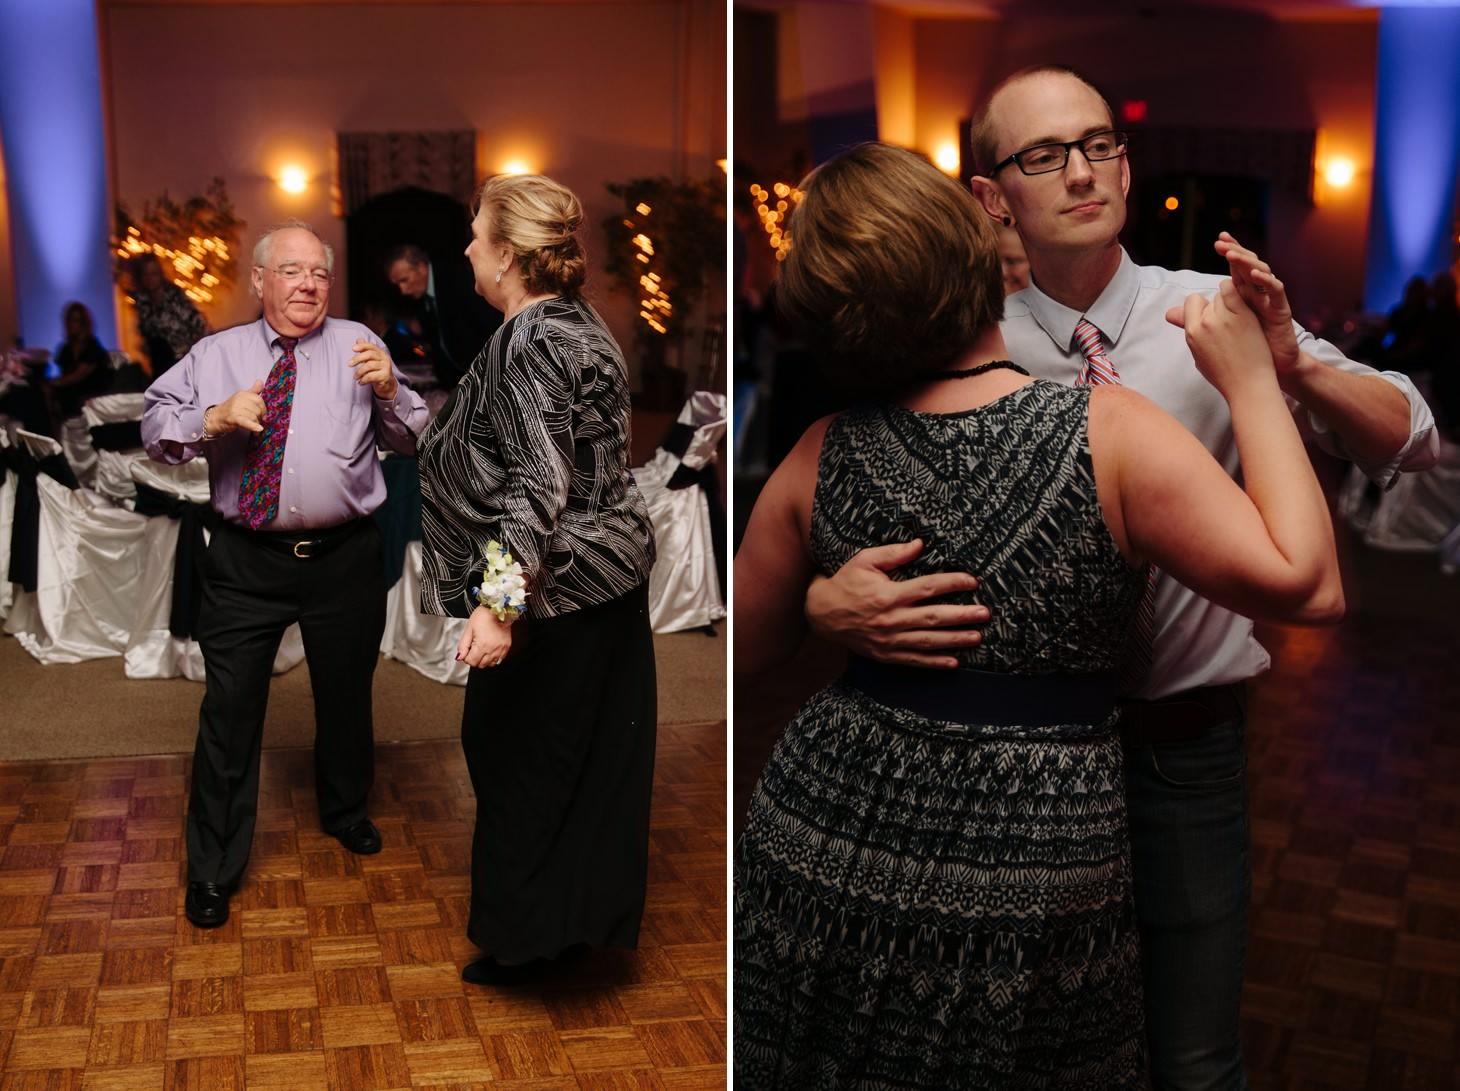 056-nyc-wedding-photographer-nj-nerdy-dr-who-firehouse-wedding-smitten-chickens.jpg